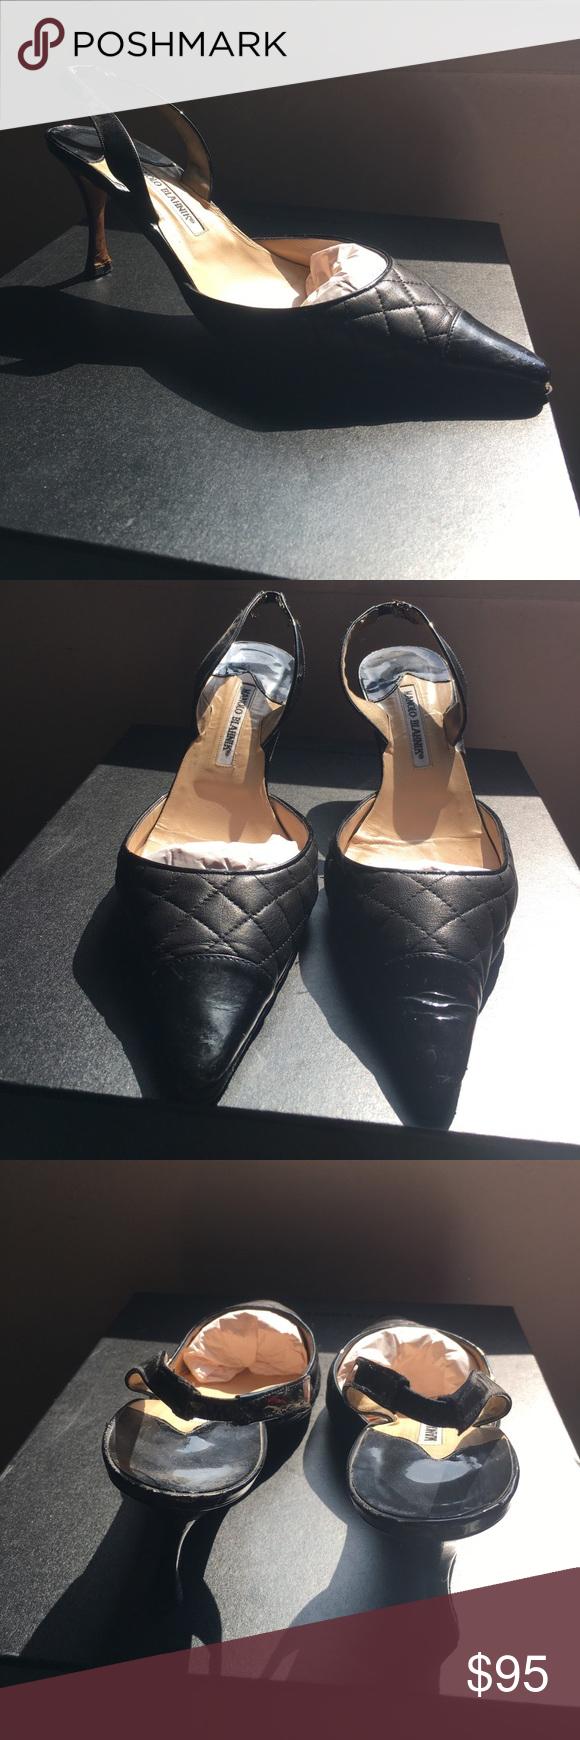 "Manolo Blahnik pumps Black open back pumps quilted leather. Bottom has been redone. Very good condition. 3"" heel. Manolo Blahnik Shoes Heels"